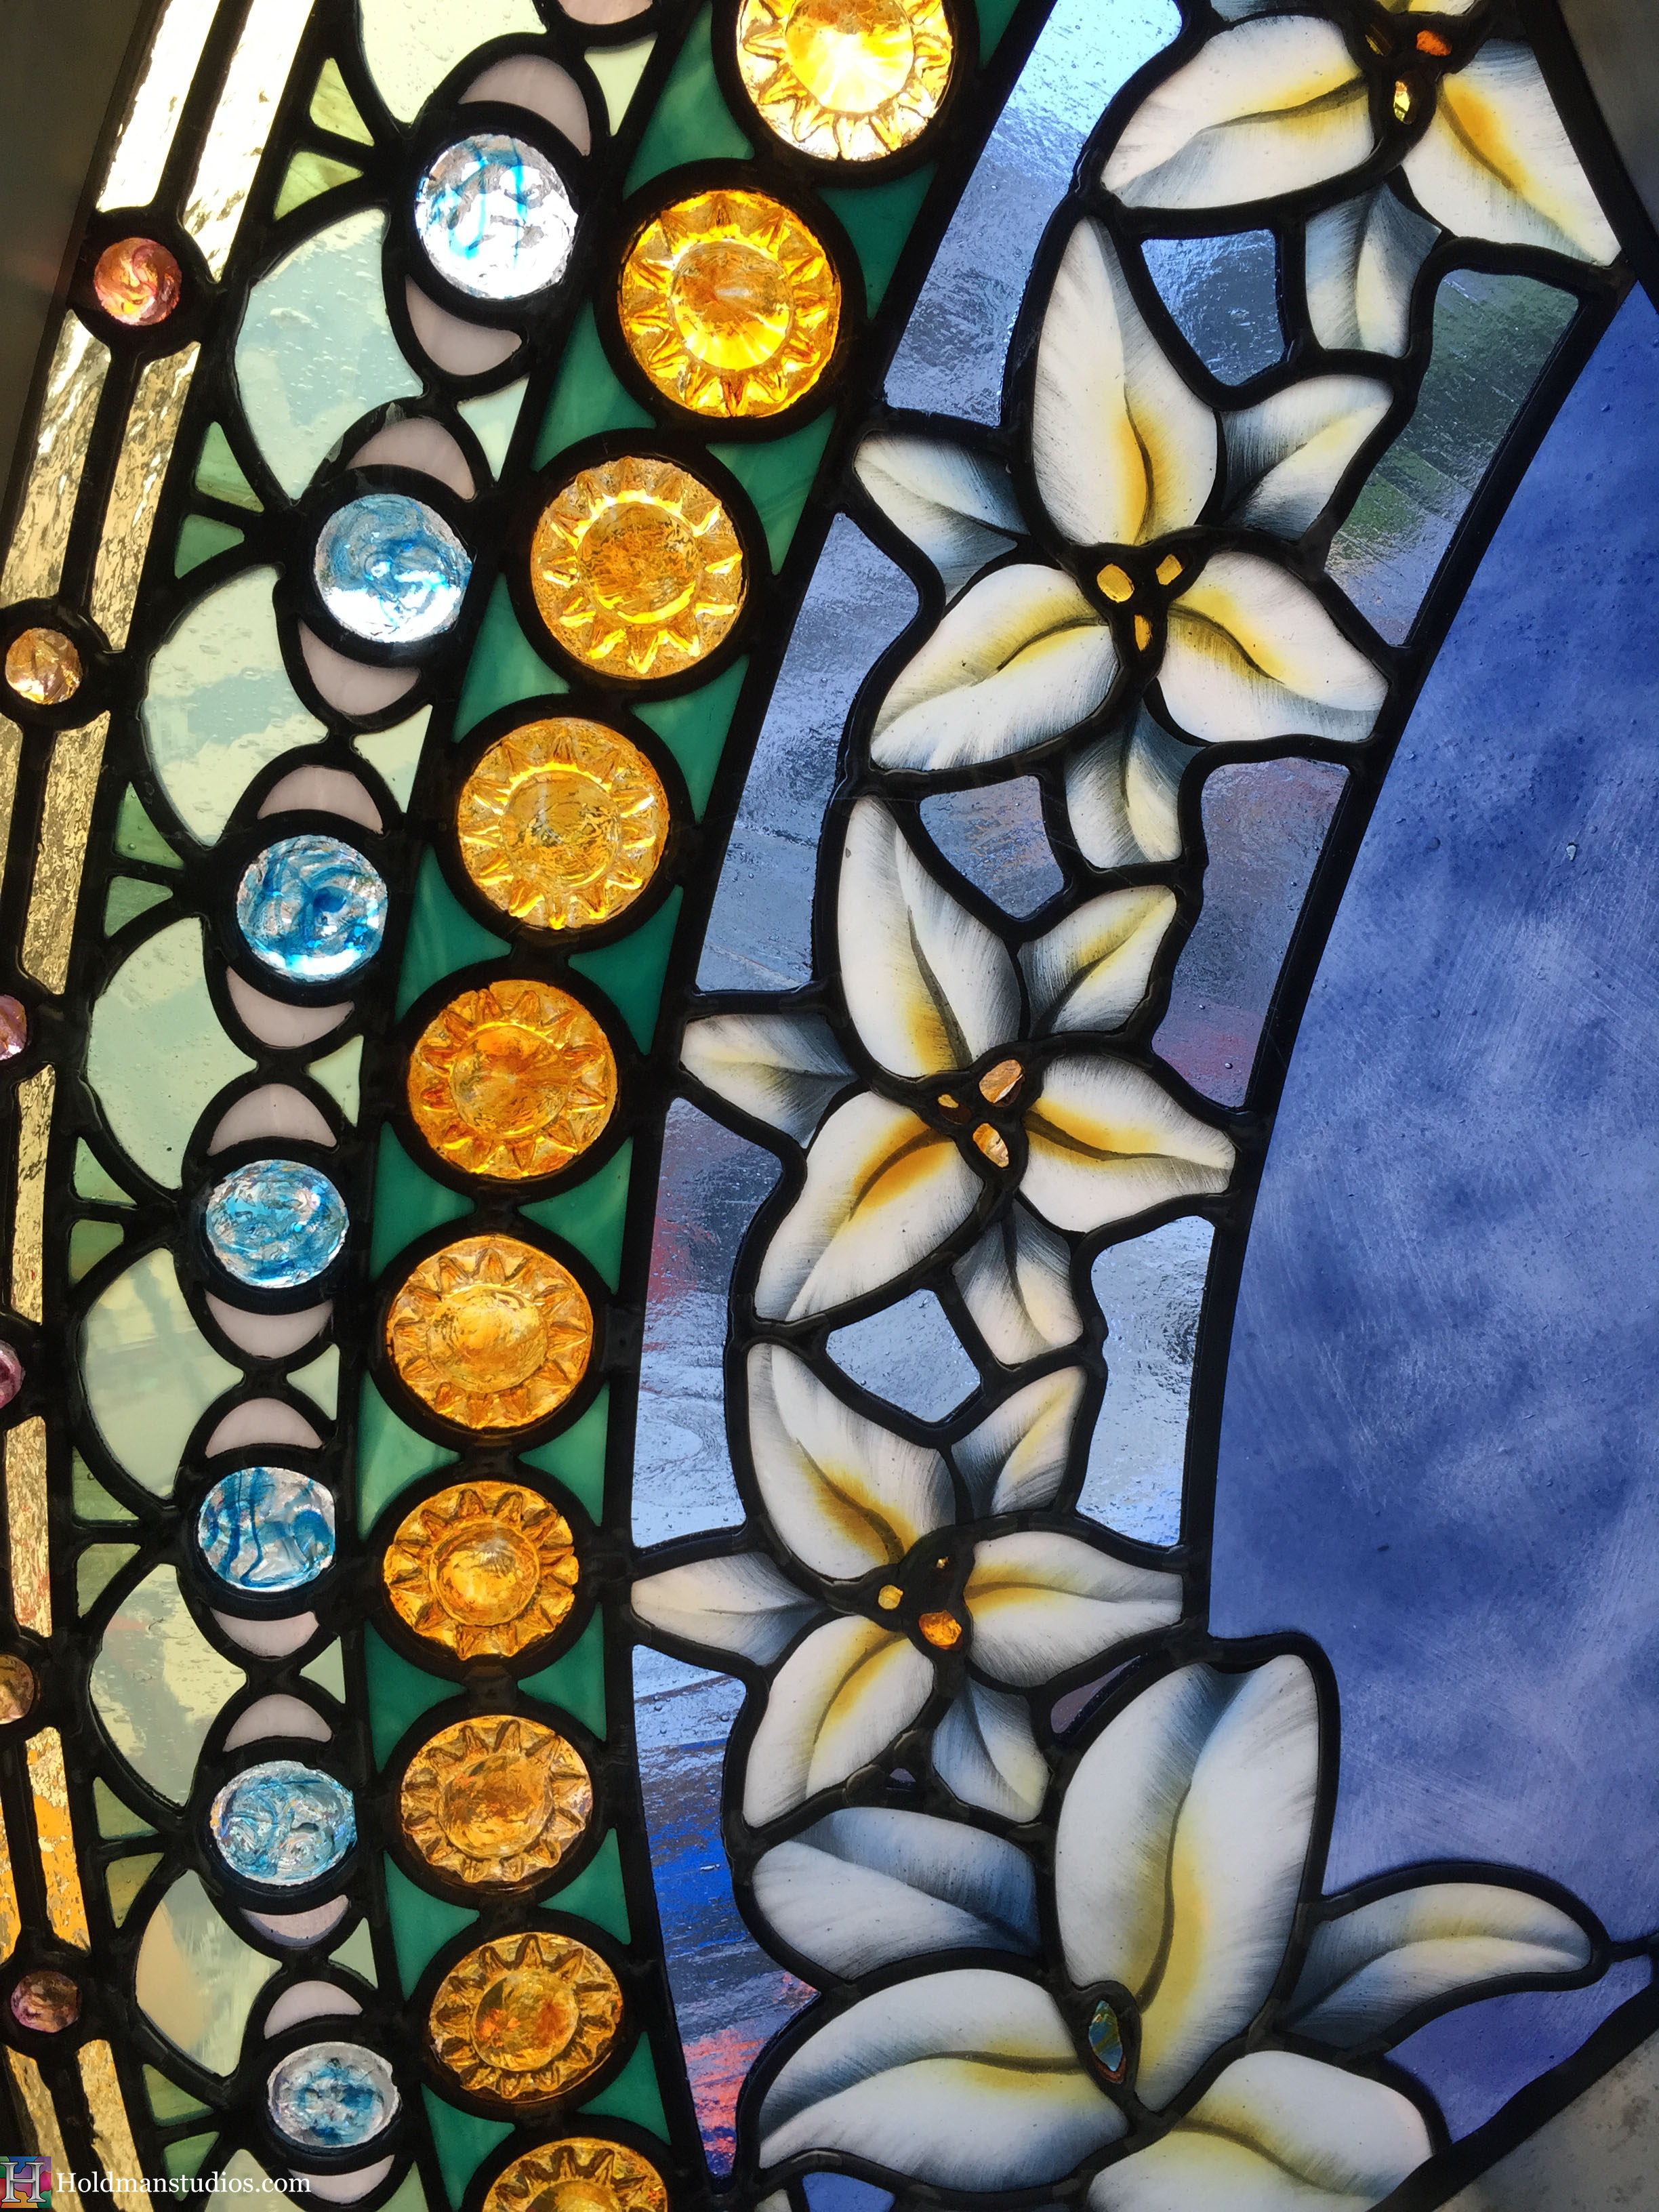 Holdman-Studios-Stained-Glass-Paris-LDS-Temple-Madonna-Lily-Flowers-Leaves-Handmade-Jewels-Crop-Window.jpg